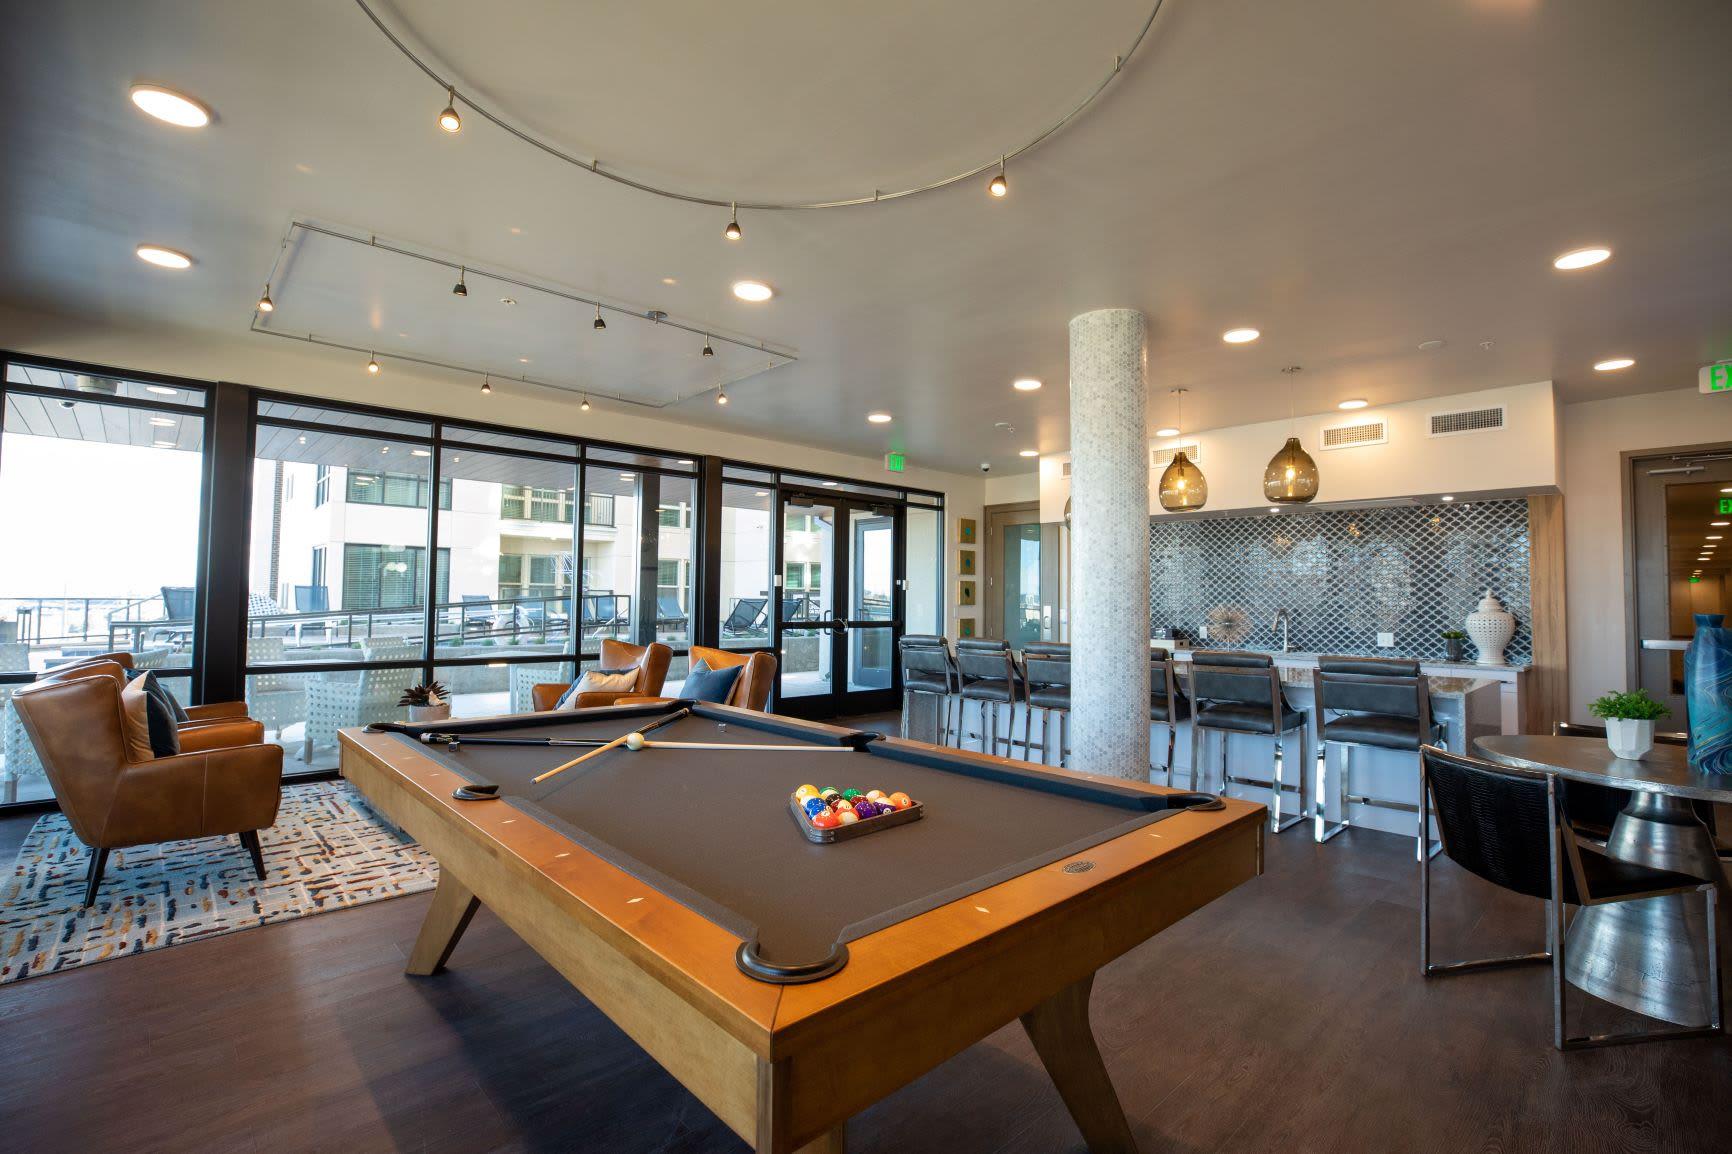 Billiard room at The Alcott in Downtown Denver, Colorado